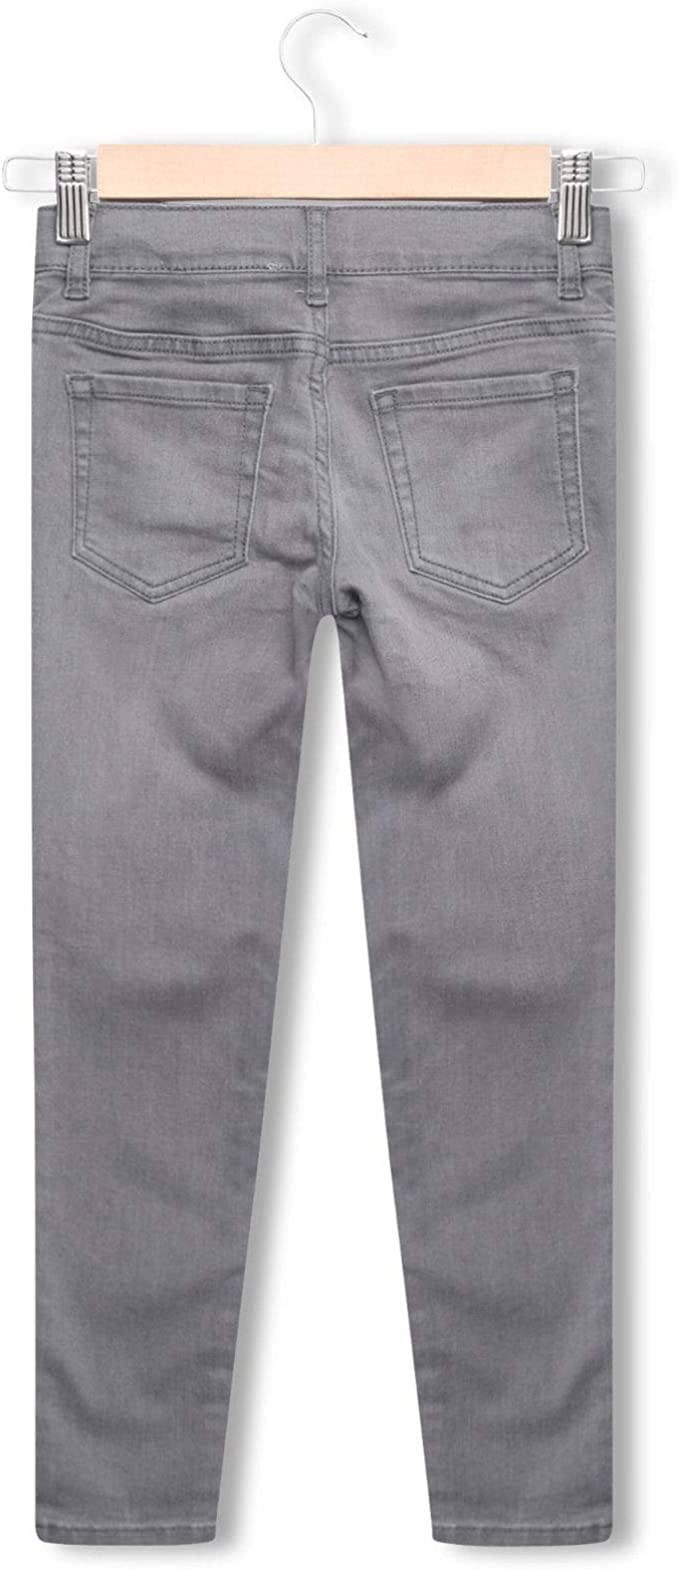 Ex Highstreet Girls Kids Stretch Plain Slim Skinny Jeans Jegging Trousers Denim /& Grey